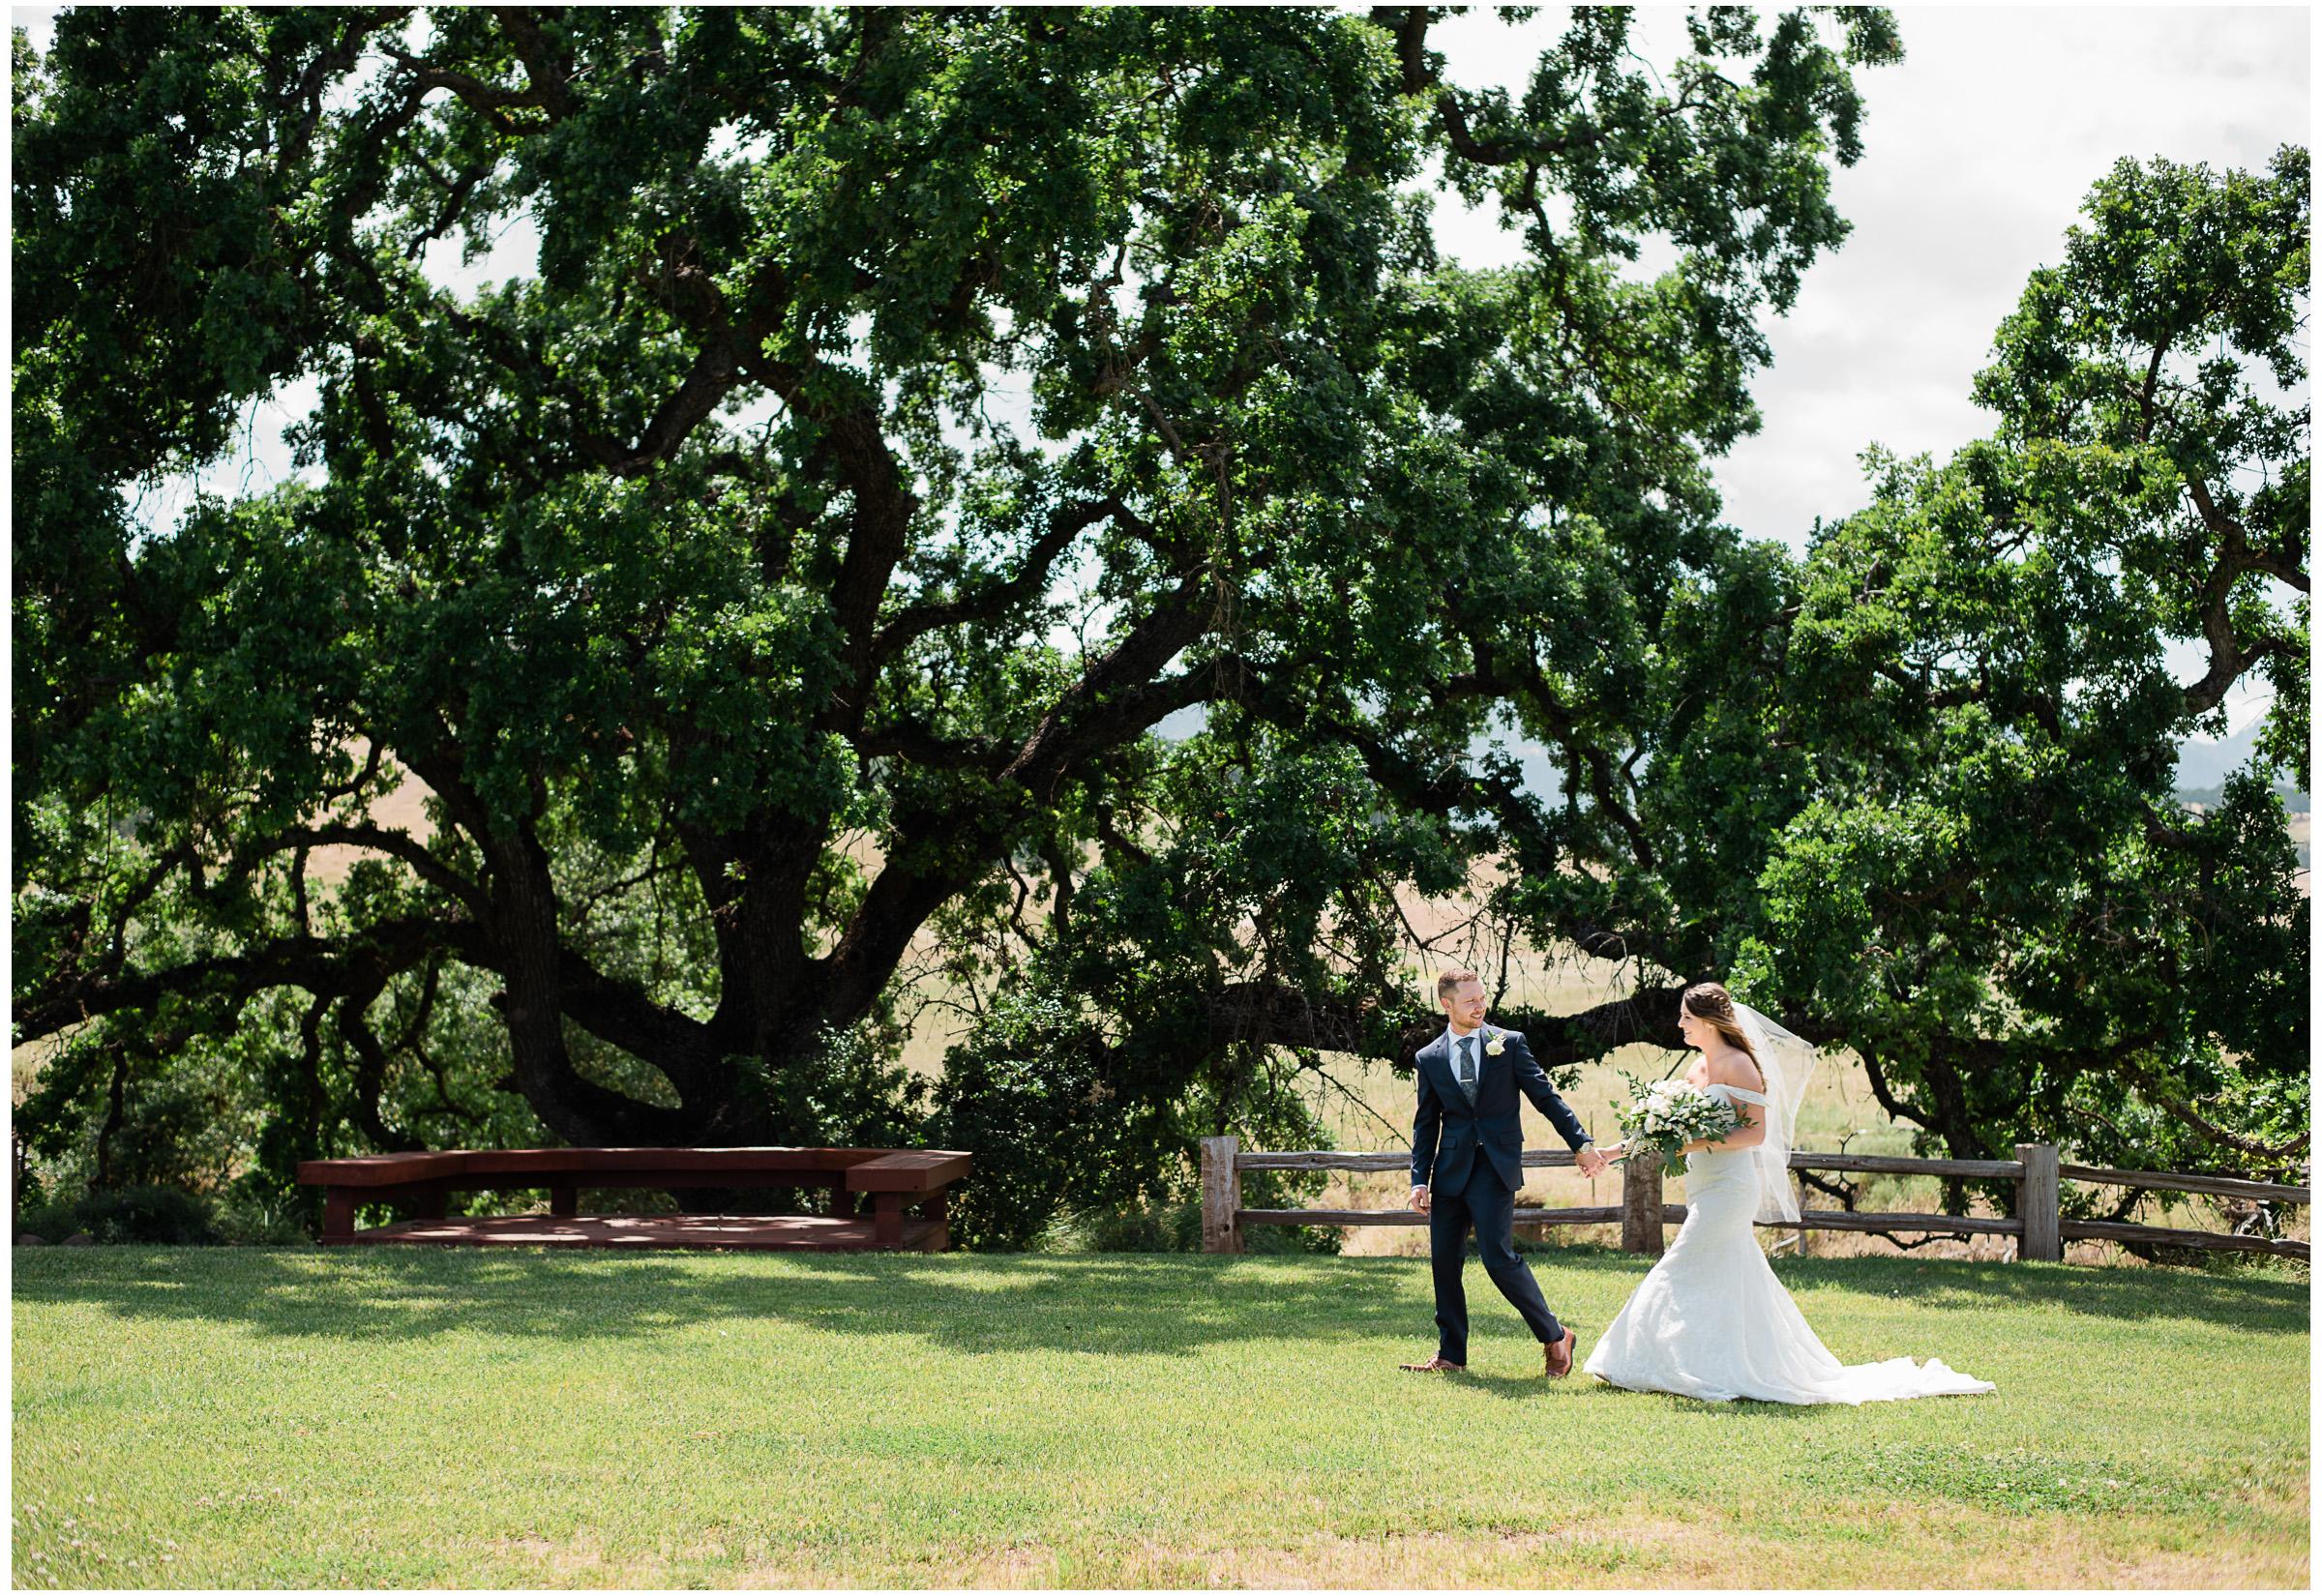 Winters Wedding - Sacramento Photographer - Field & Pond - Justin Wilcox Photography - 13.jpg